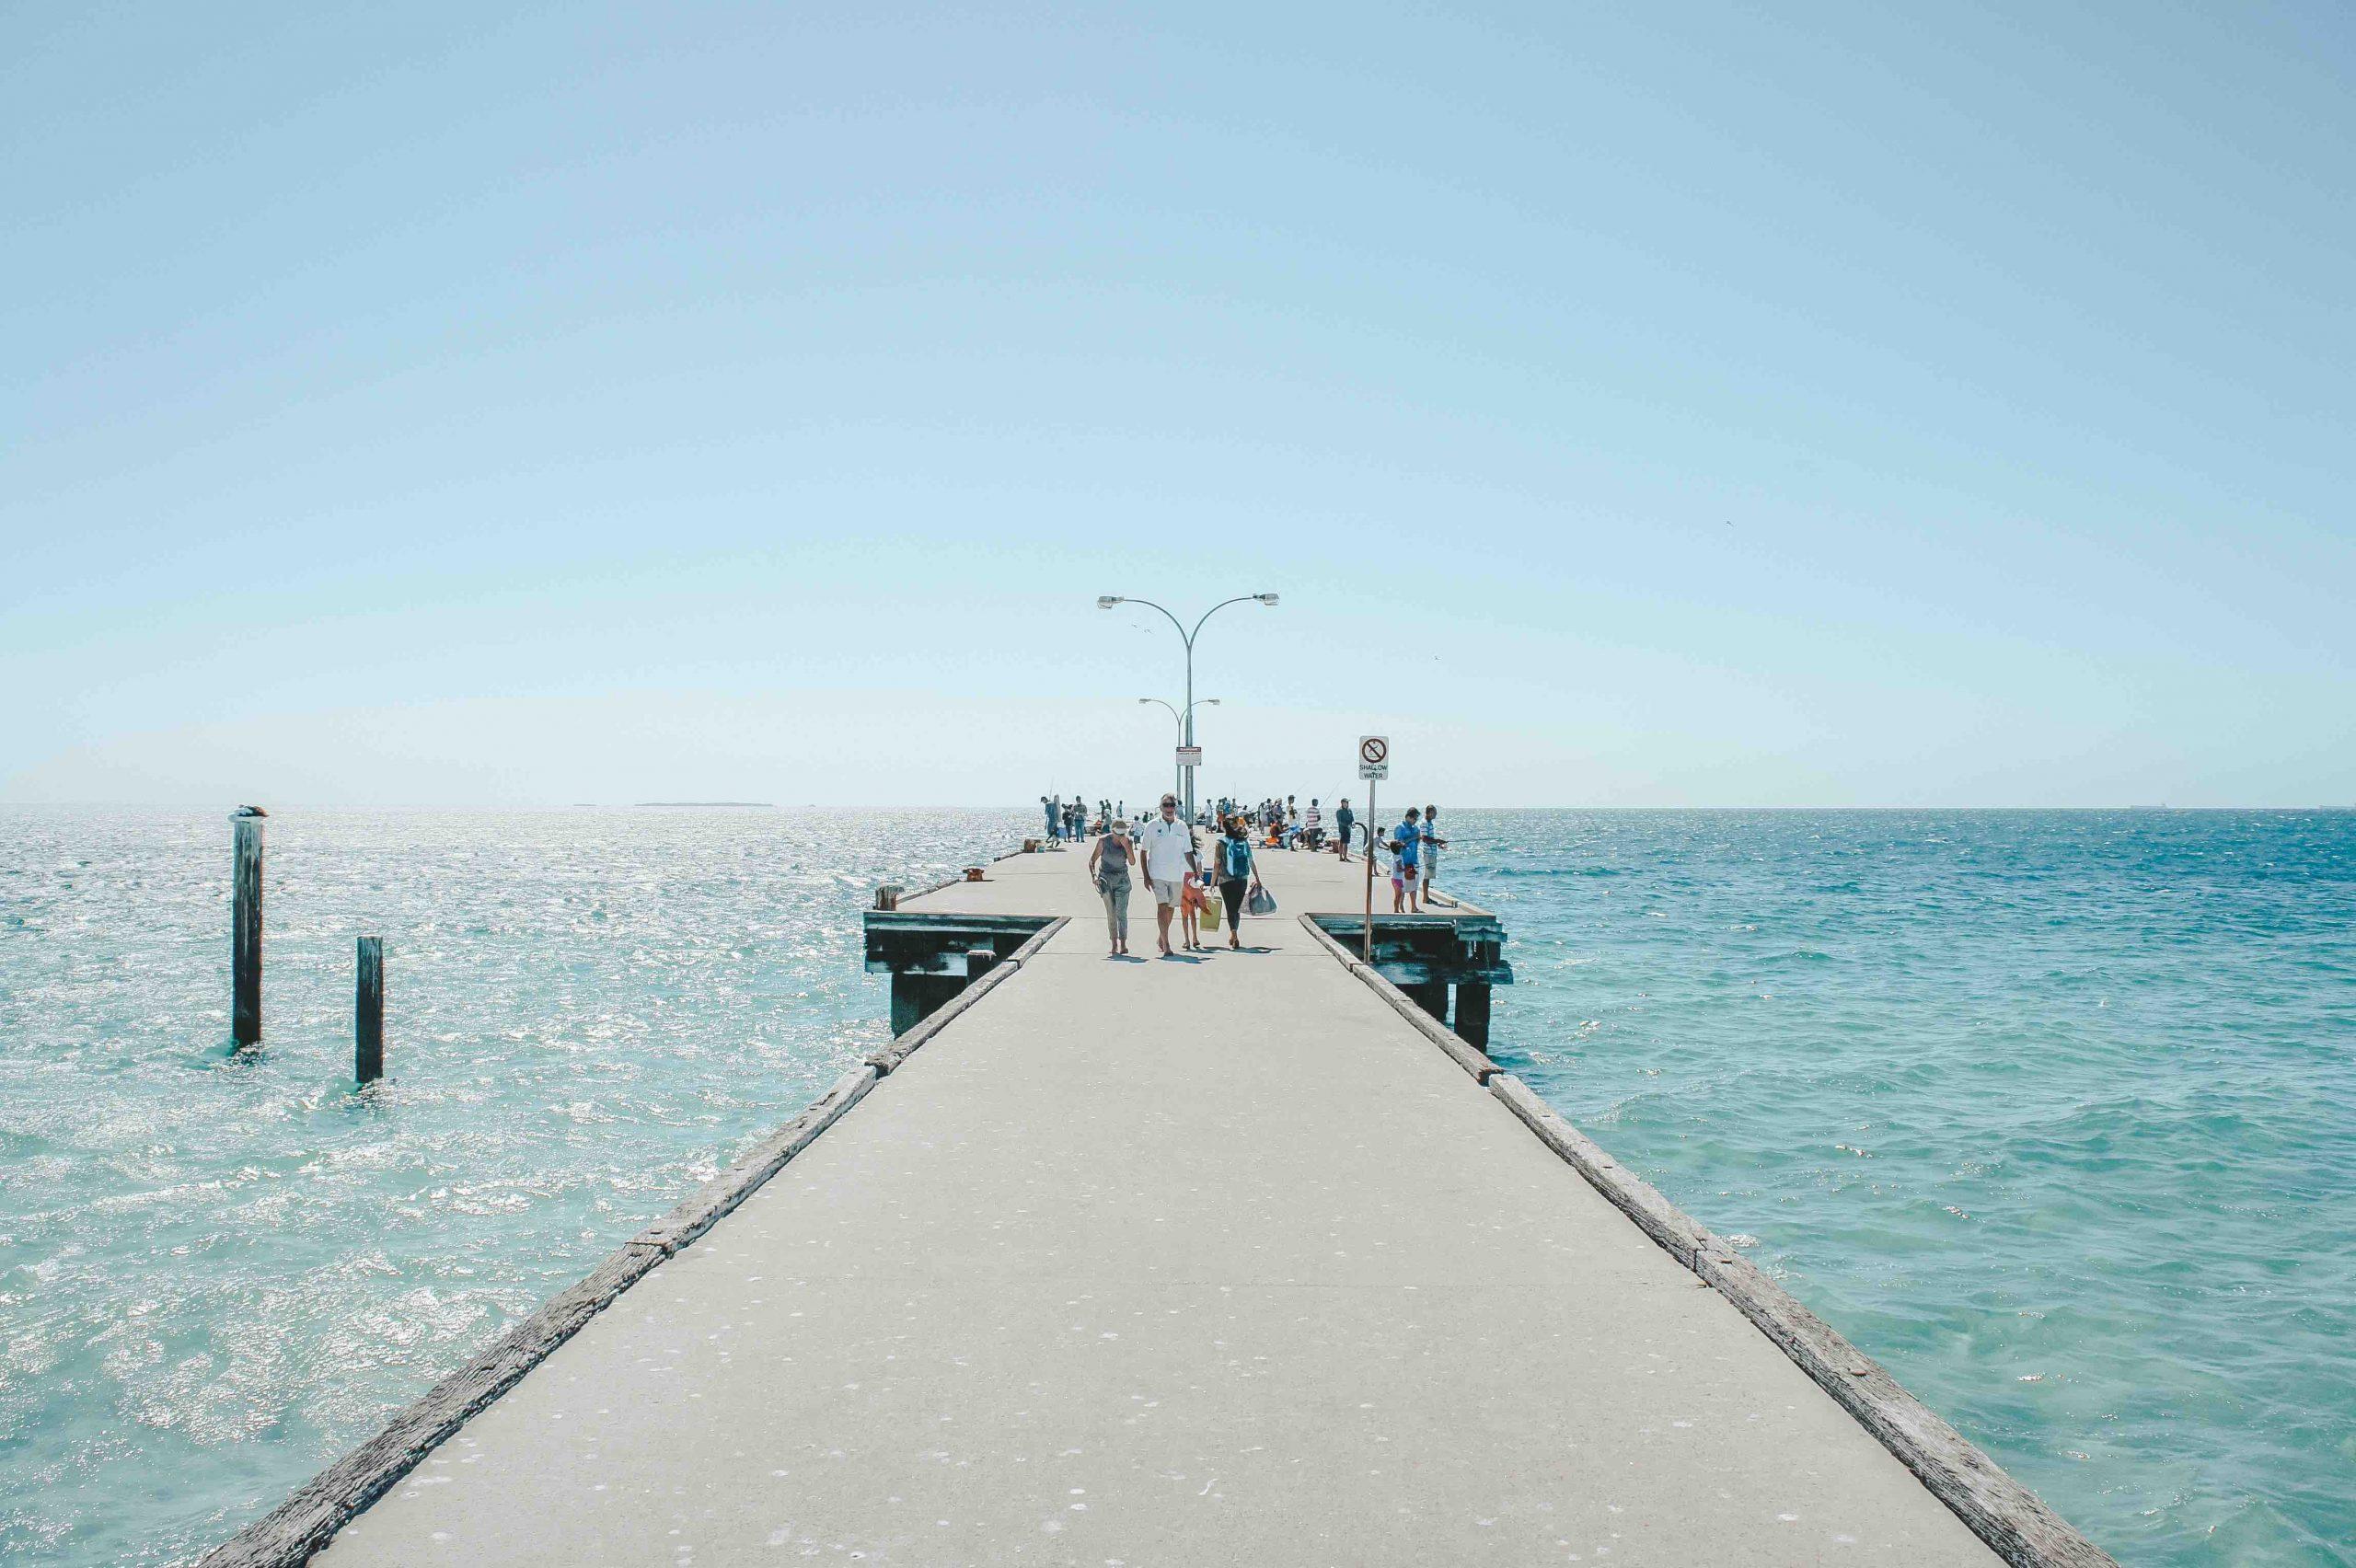 Coogee beach, Western Australia